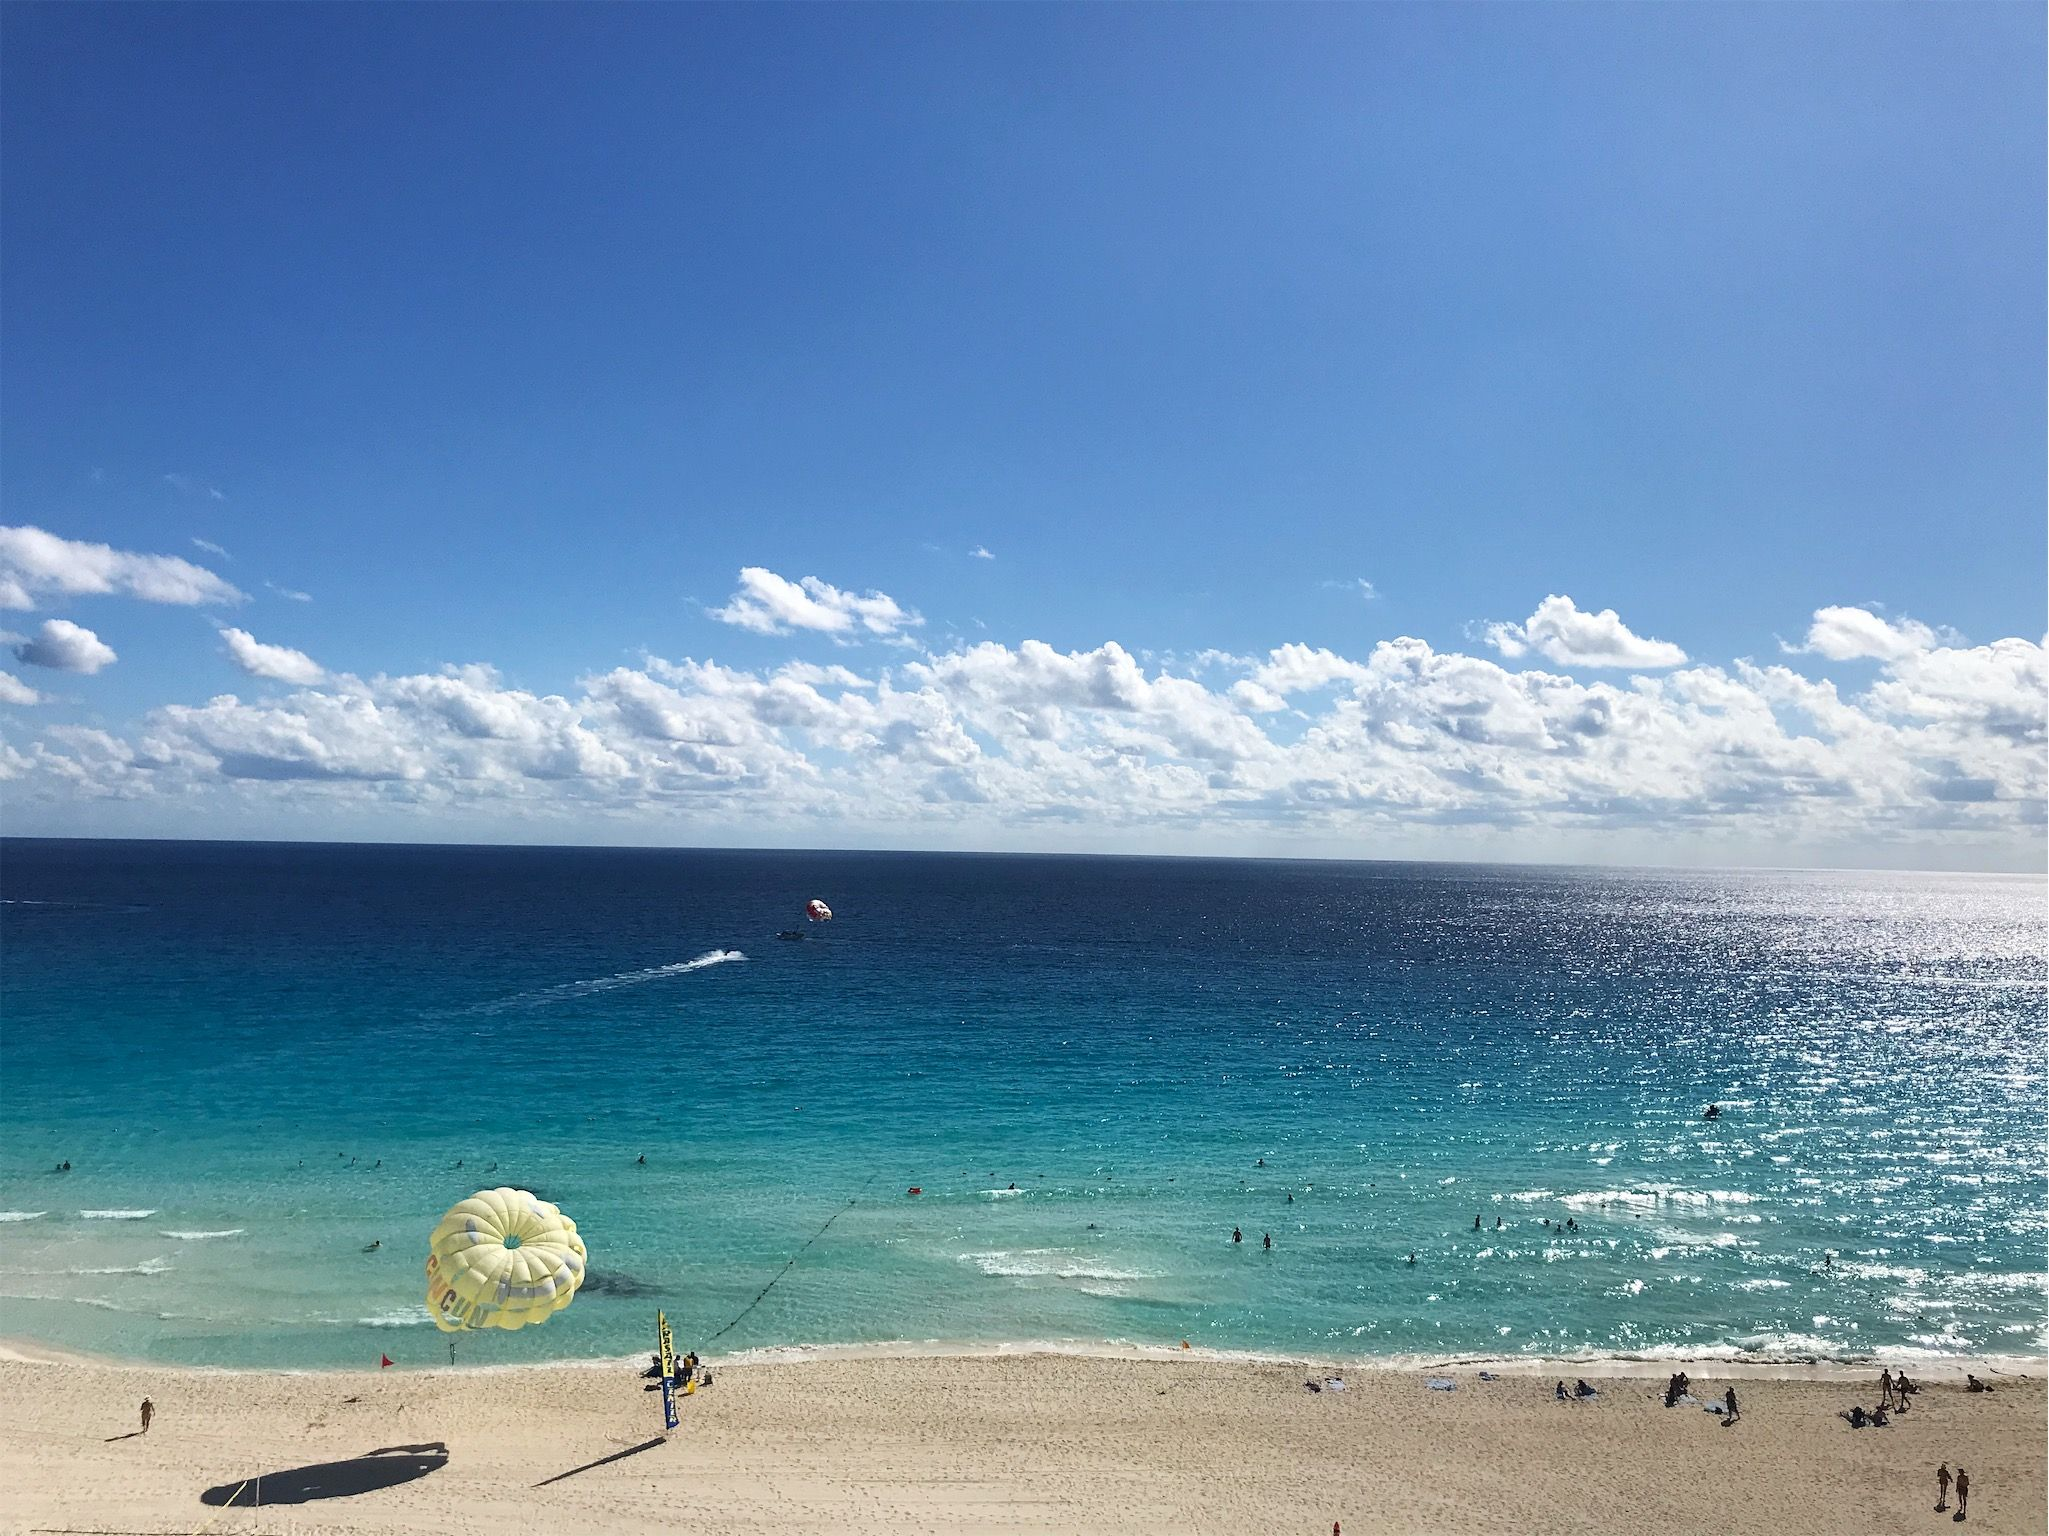 #cancun #thevine #bougie #boujee #parasailing #ocean #water #waves #beach #theplaya #sand #pictureperfect #clouds #views #vista #quintanaroo | meeklaa | VSCO